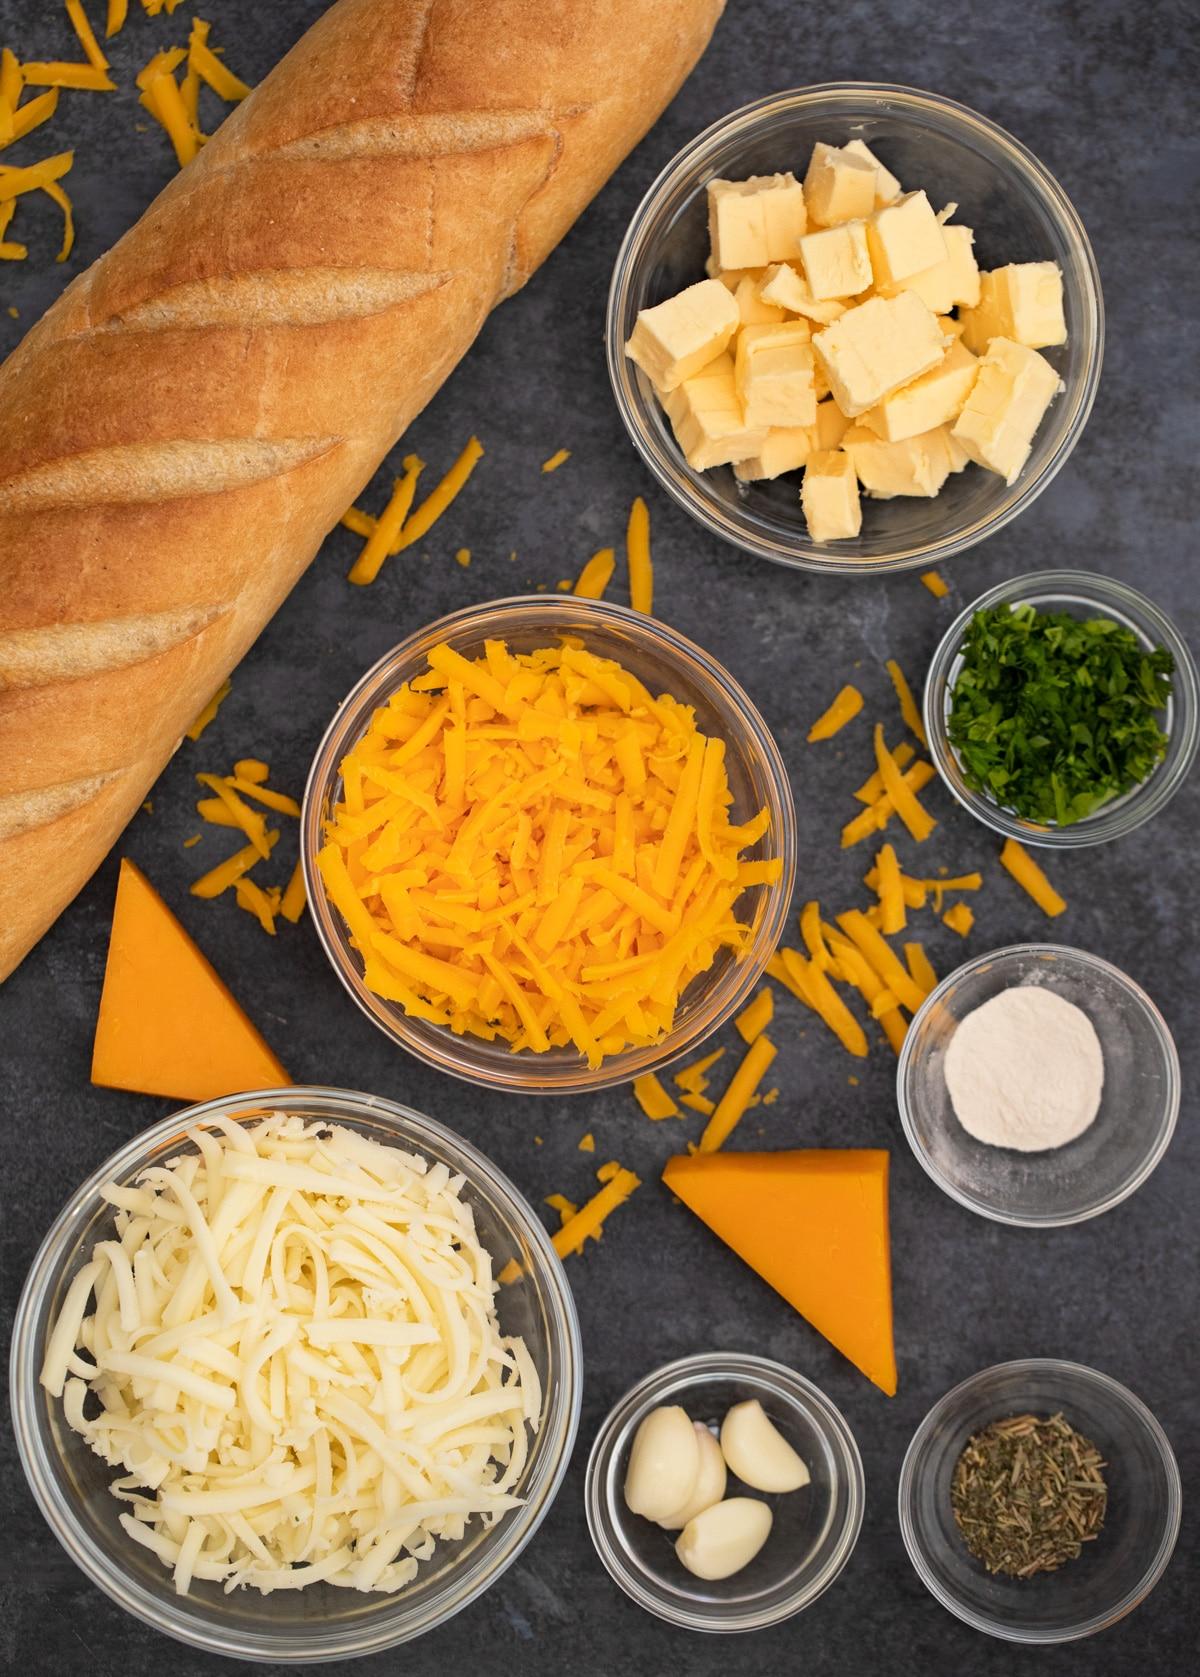 Cheesy garlic bread ingredients